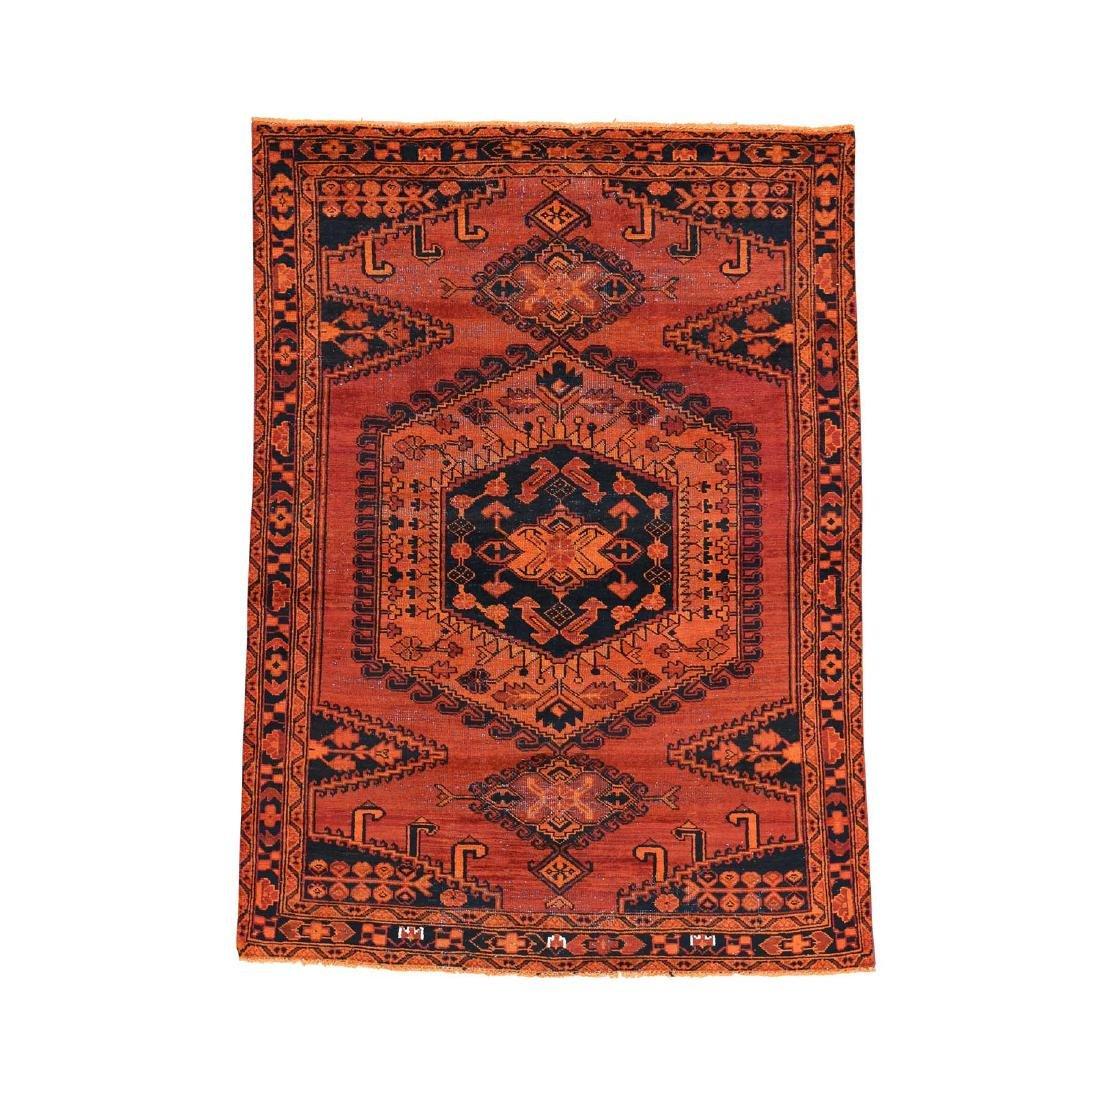 Handmade Overdyed Persian Viss Vintage Rug 4.10x6.8